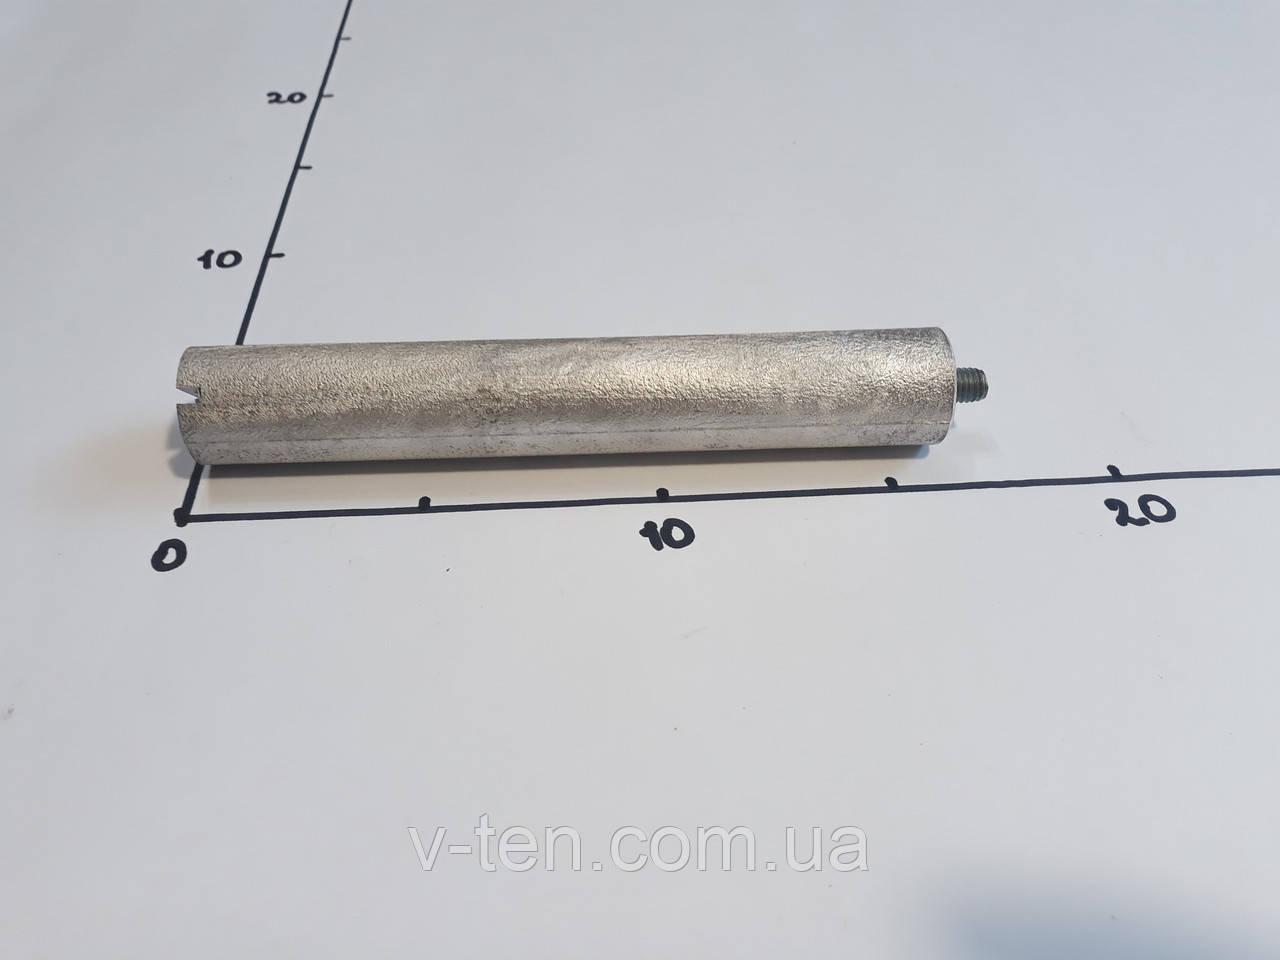 Анод магниевый Ø26 / 160 м8 / 10 (Италия)